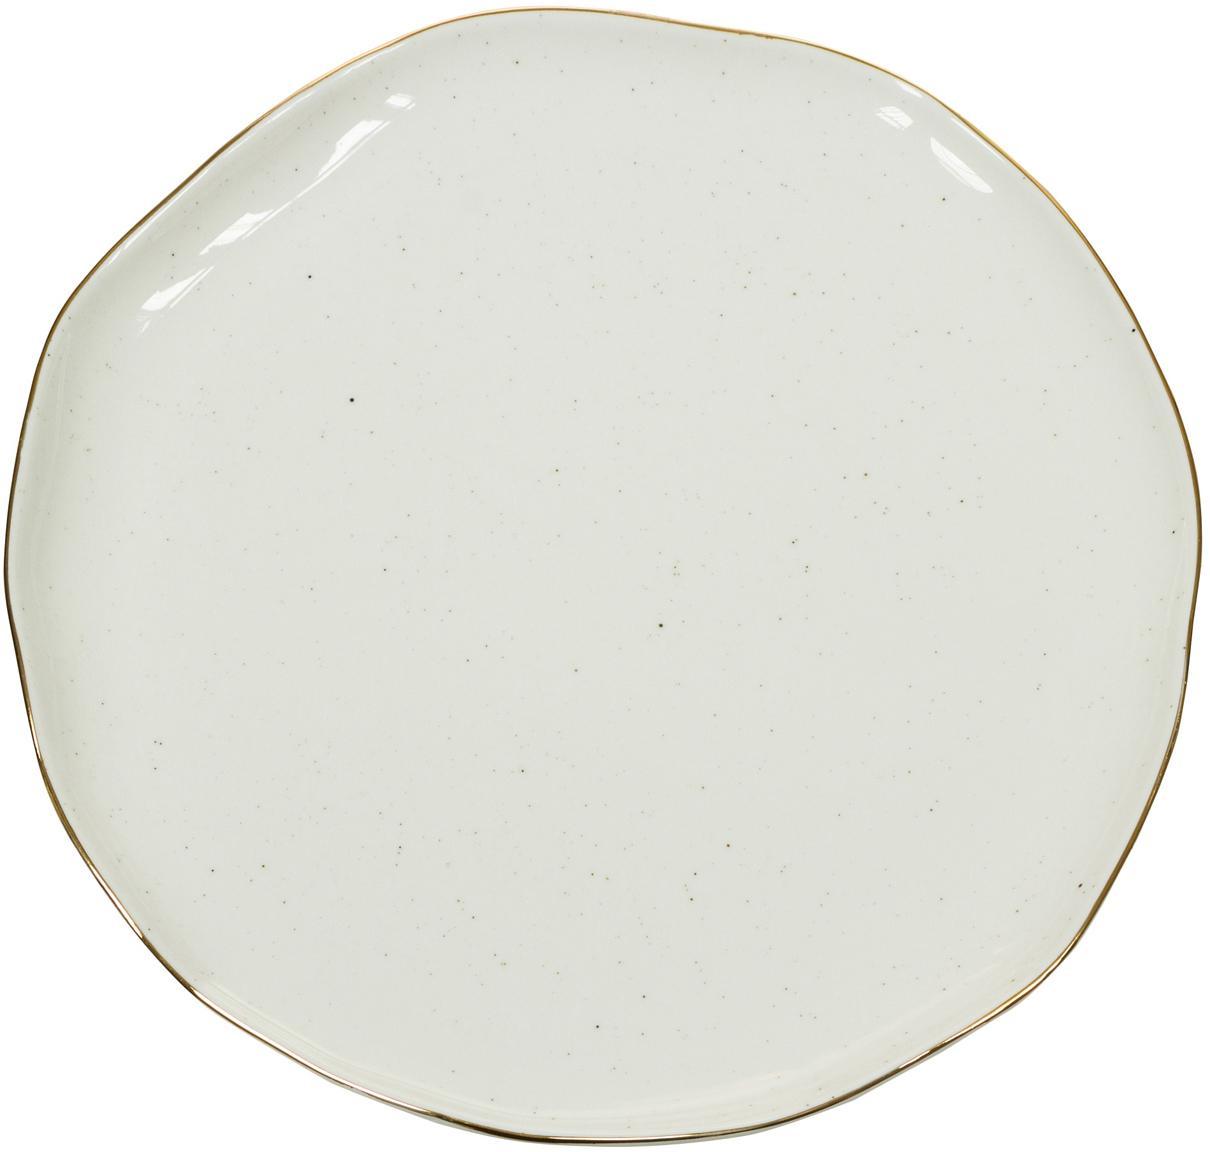 Piattino da dessert fatto a mano Bol 2 pz, Porcellana, Bianco crema, Ø 19 x Alt. 3 cm